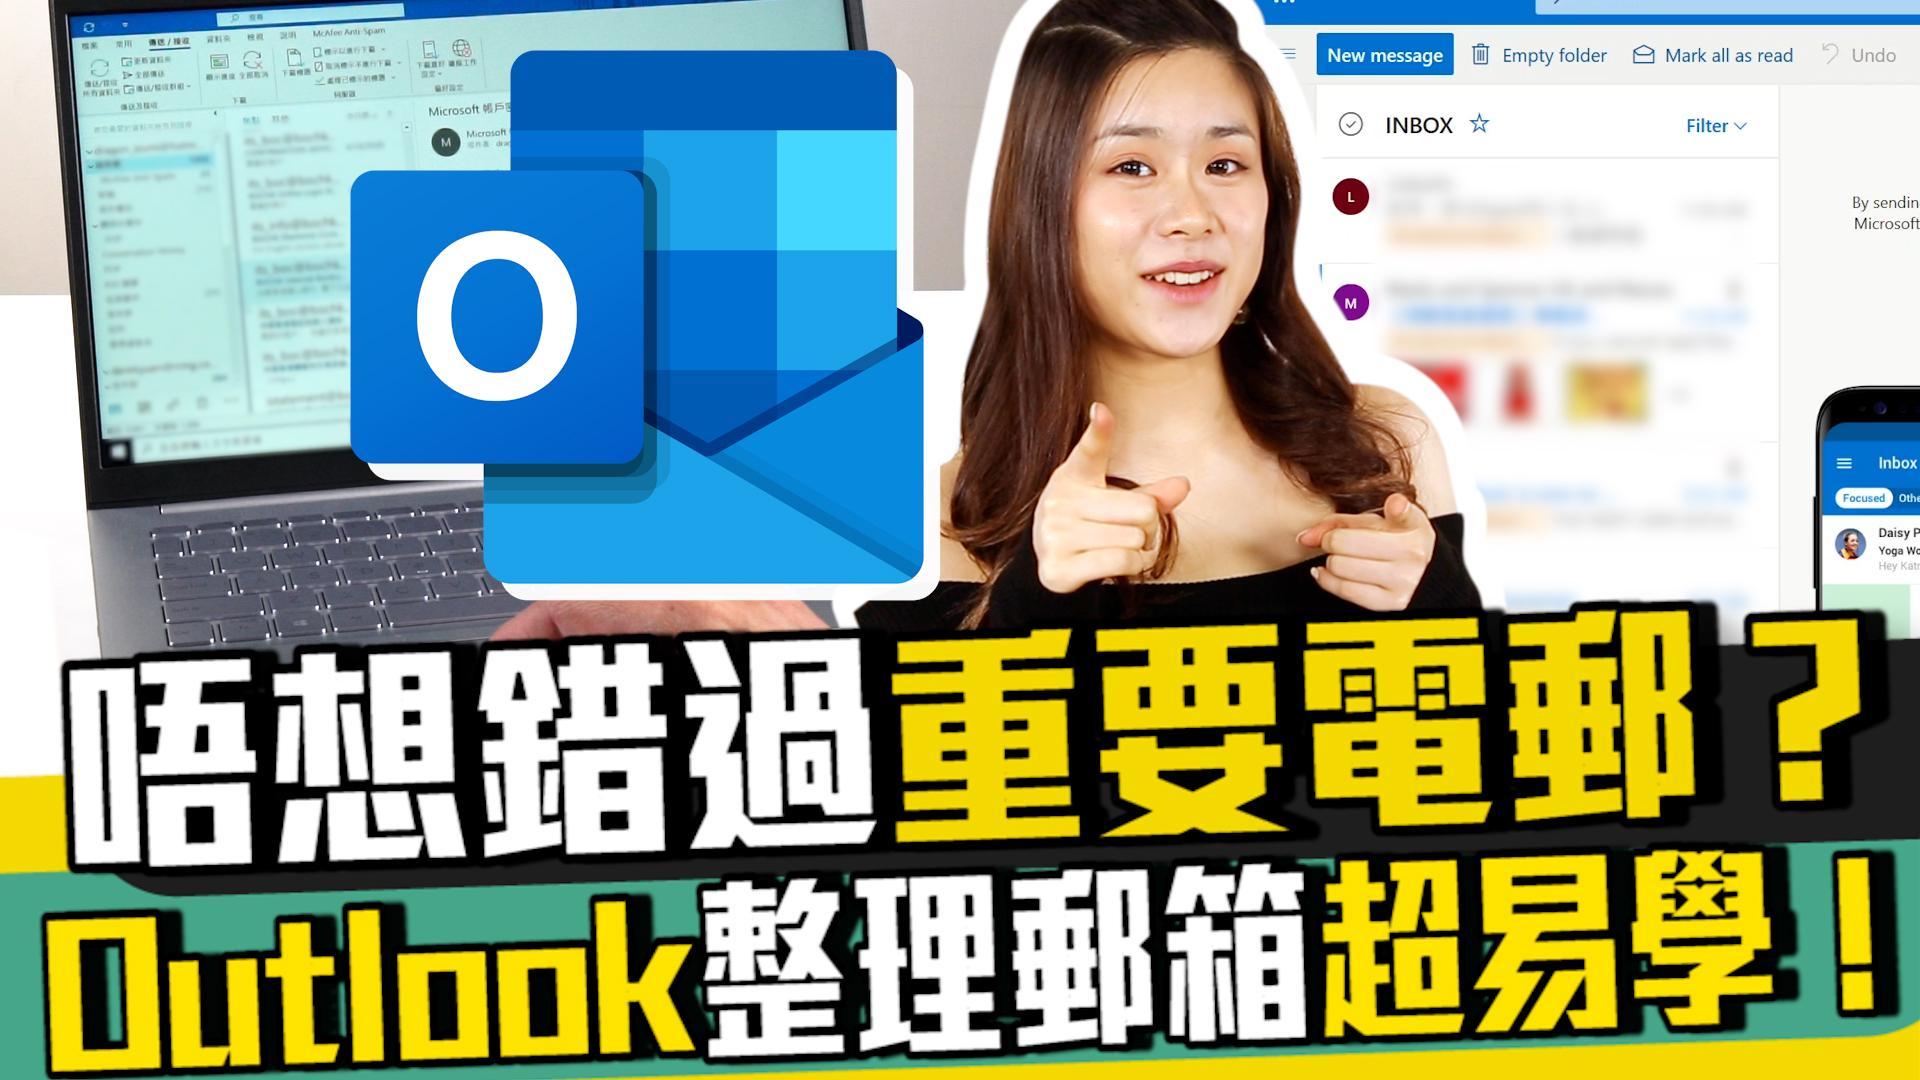 Outlook 教學!唔想錯過重要電郵?整理郵箱超易學!